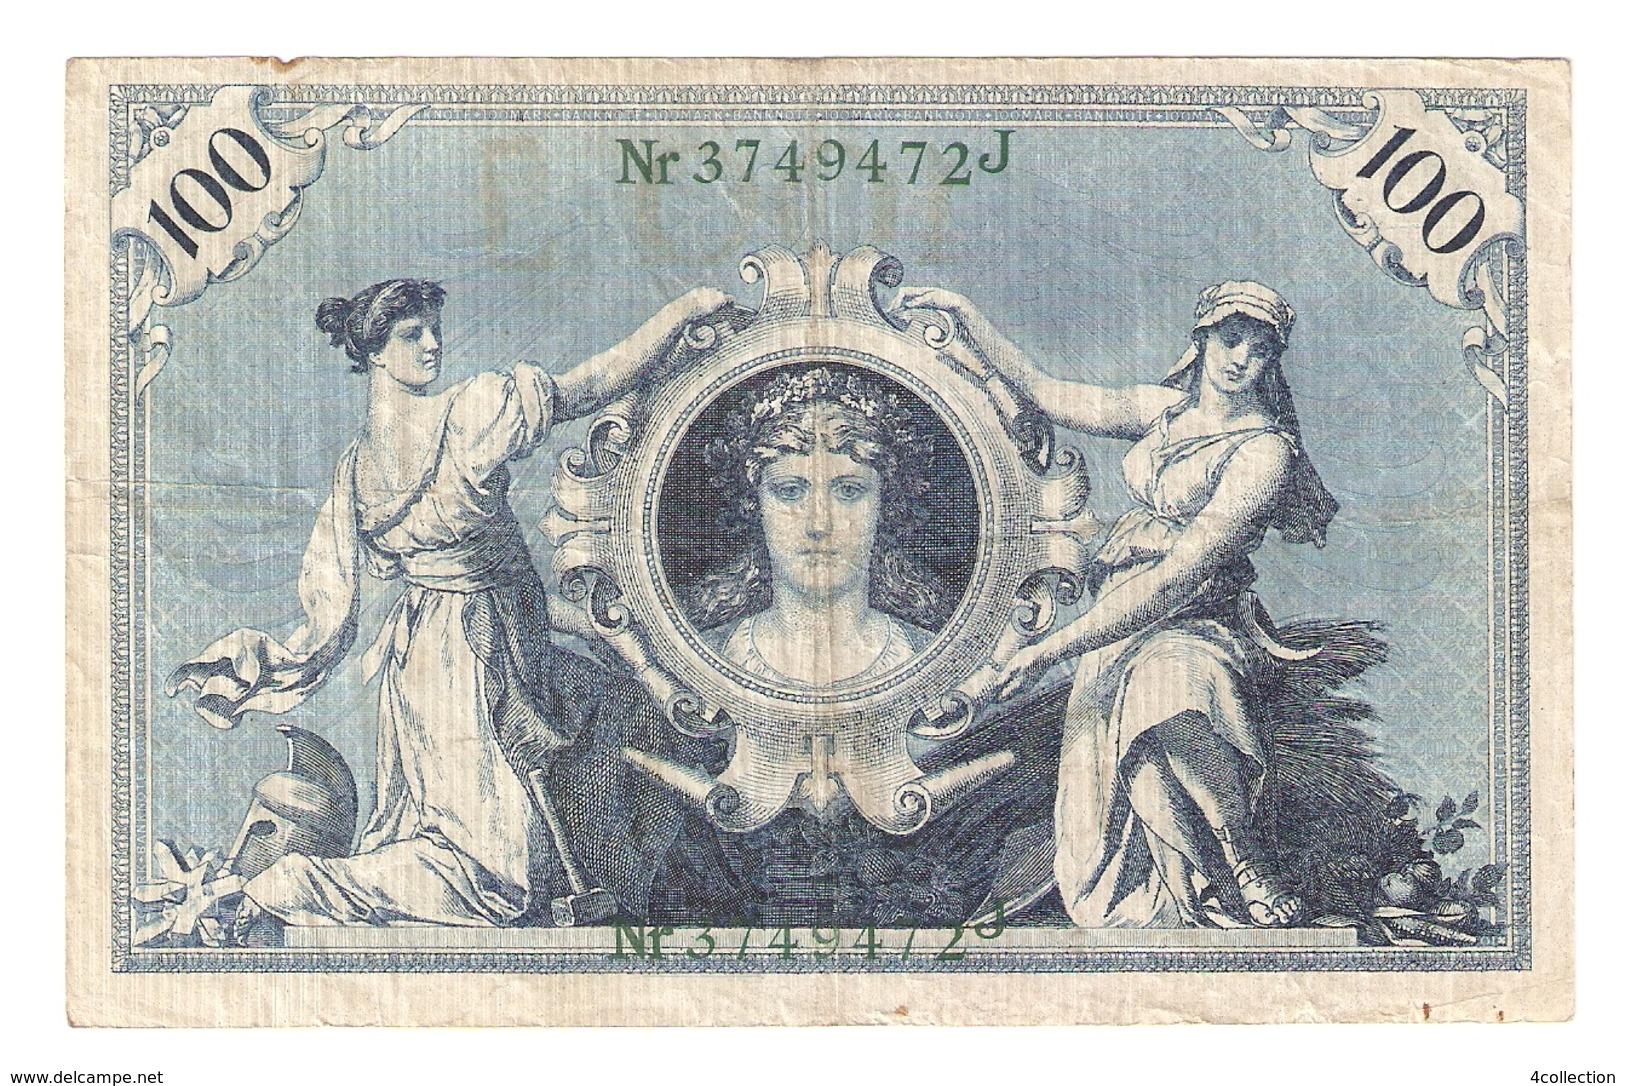 T. Germany German Empire 100 Mark 1908 Reichsbanknote Green Seal & Ser. 3749472 J - 100 Mark